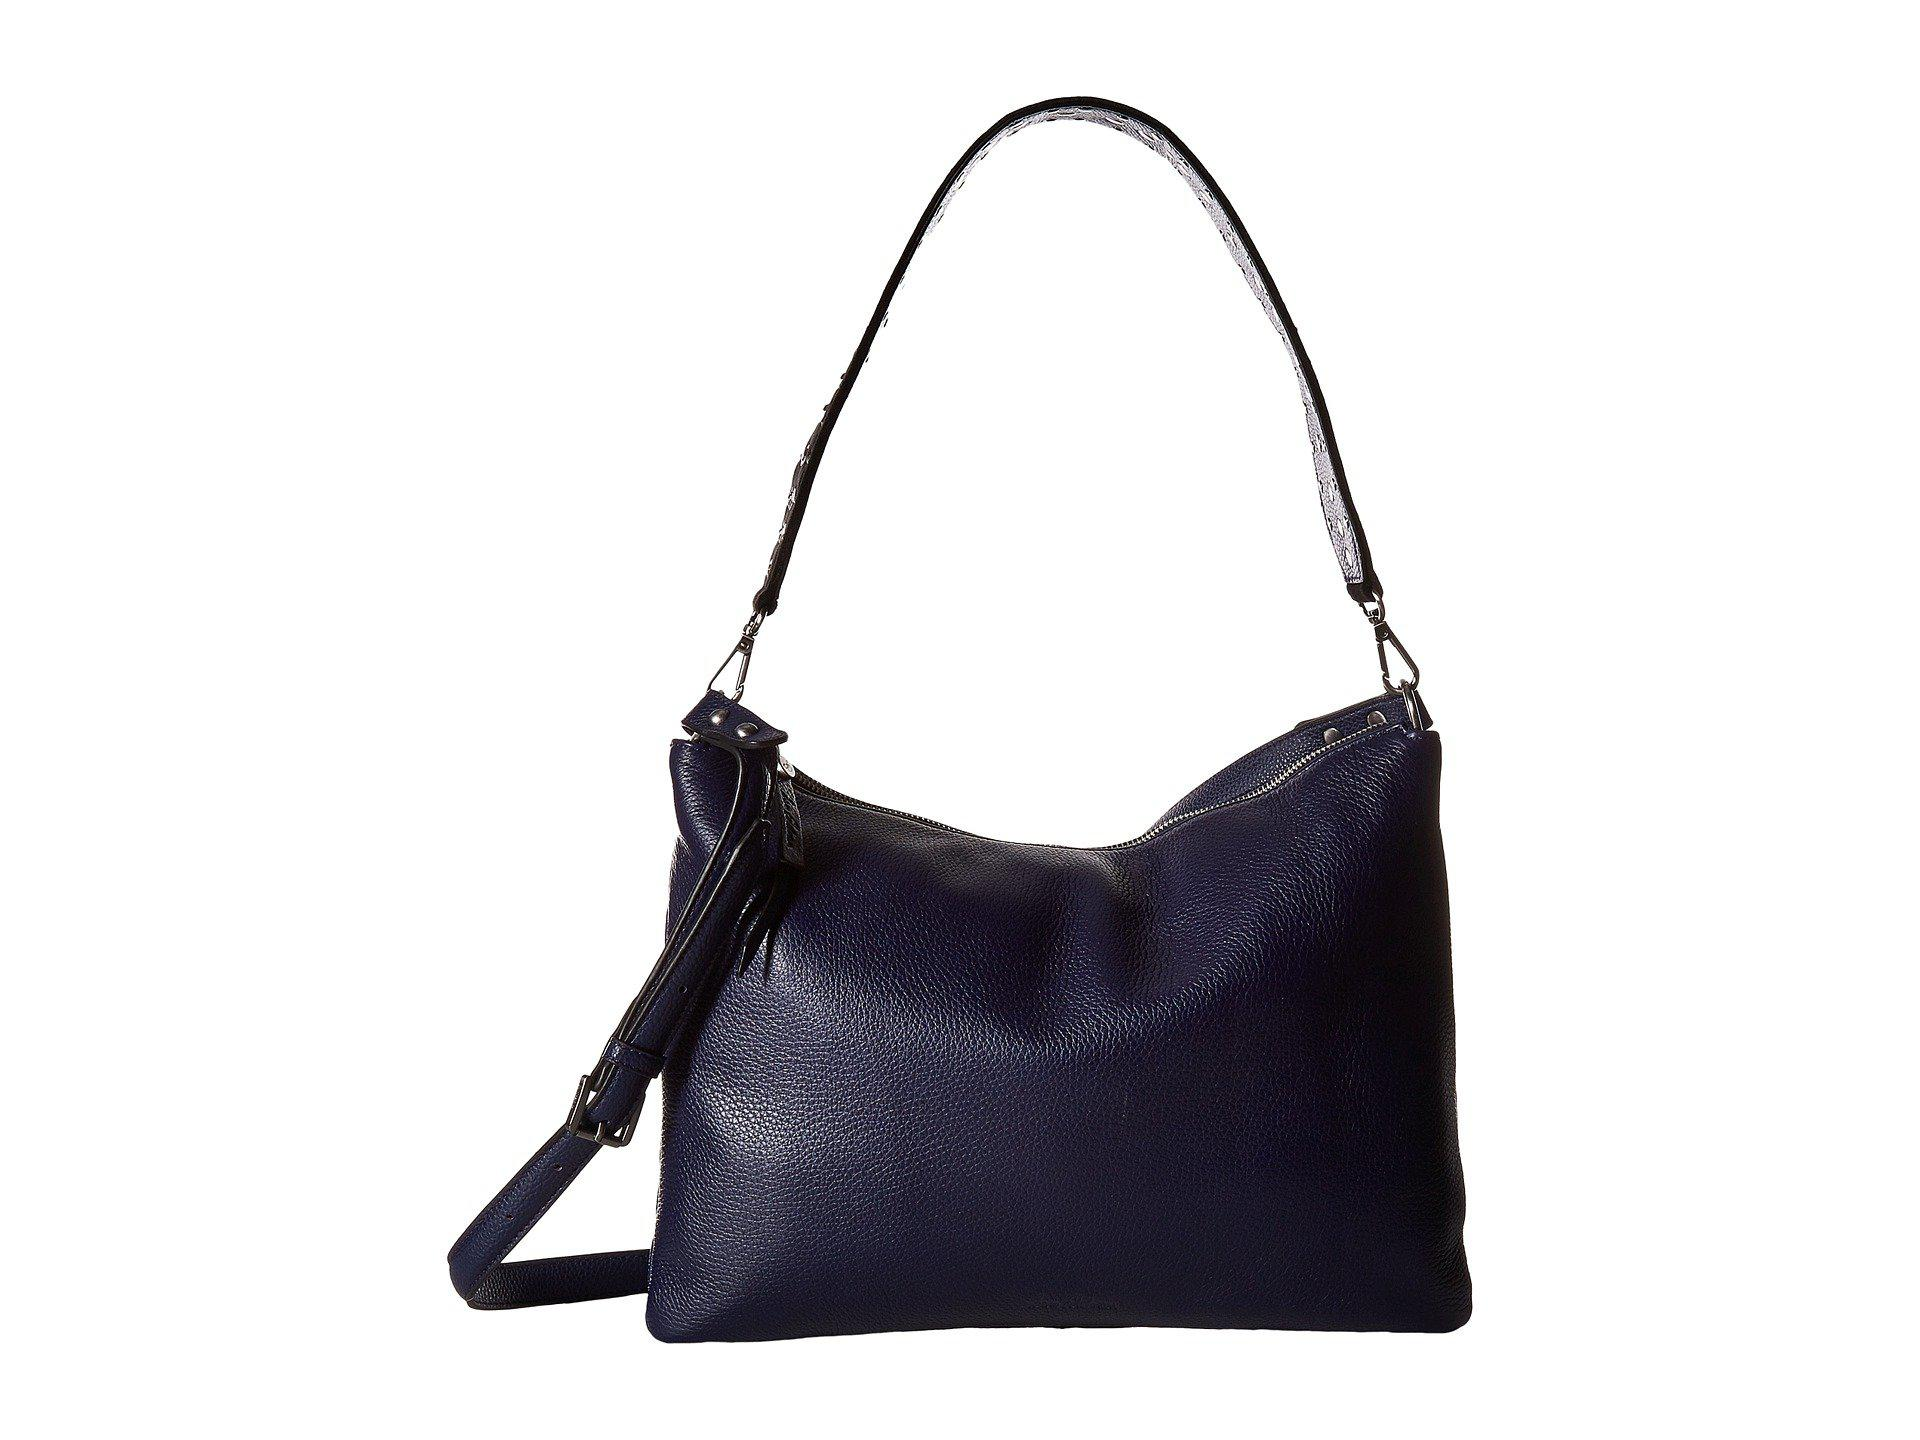 Lyst - Sam Edelman Raelyn Slouch Shoulder Bag in Blue - Save ... ec034de6a6024